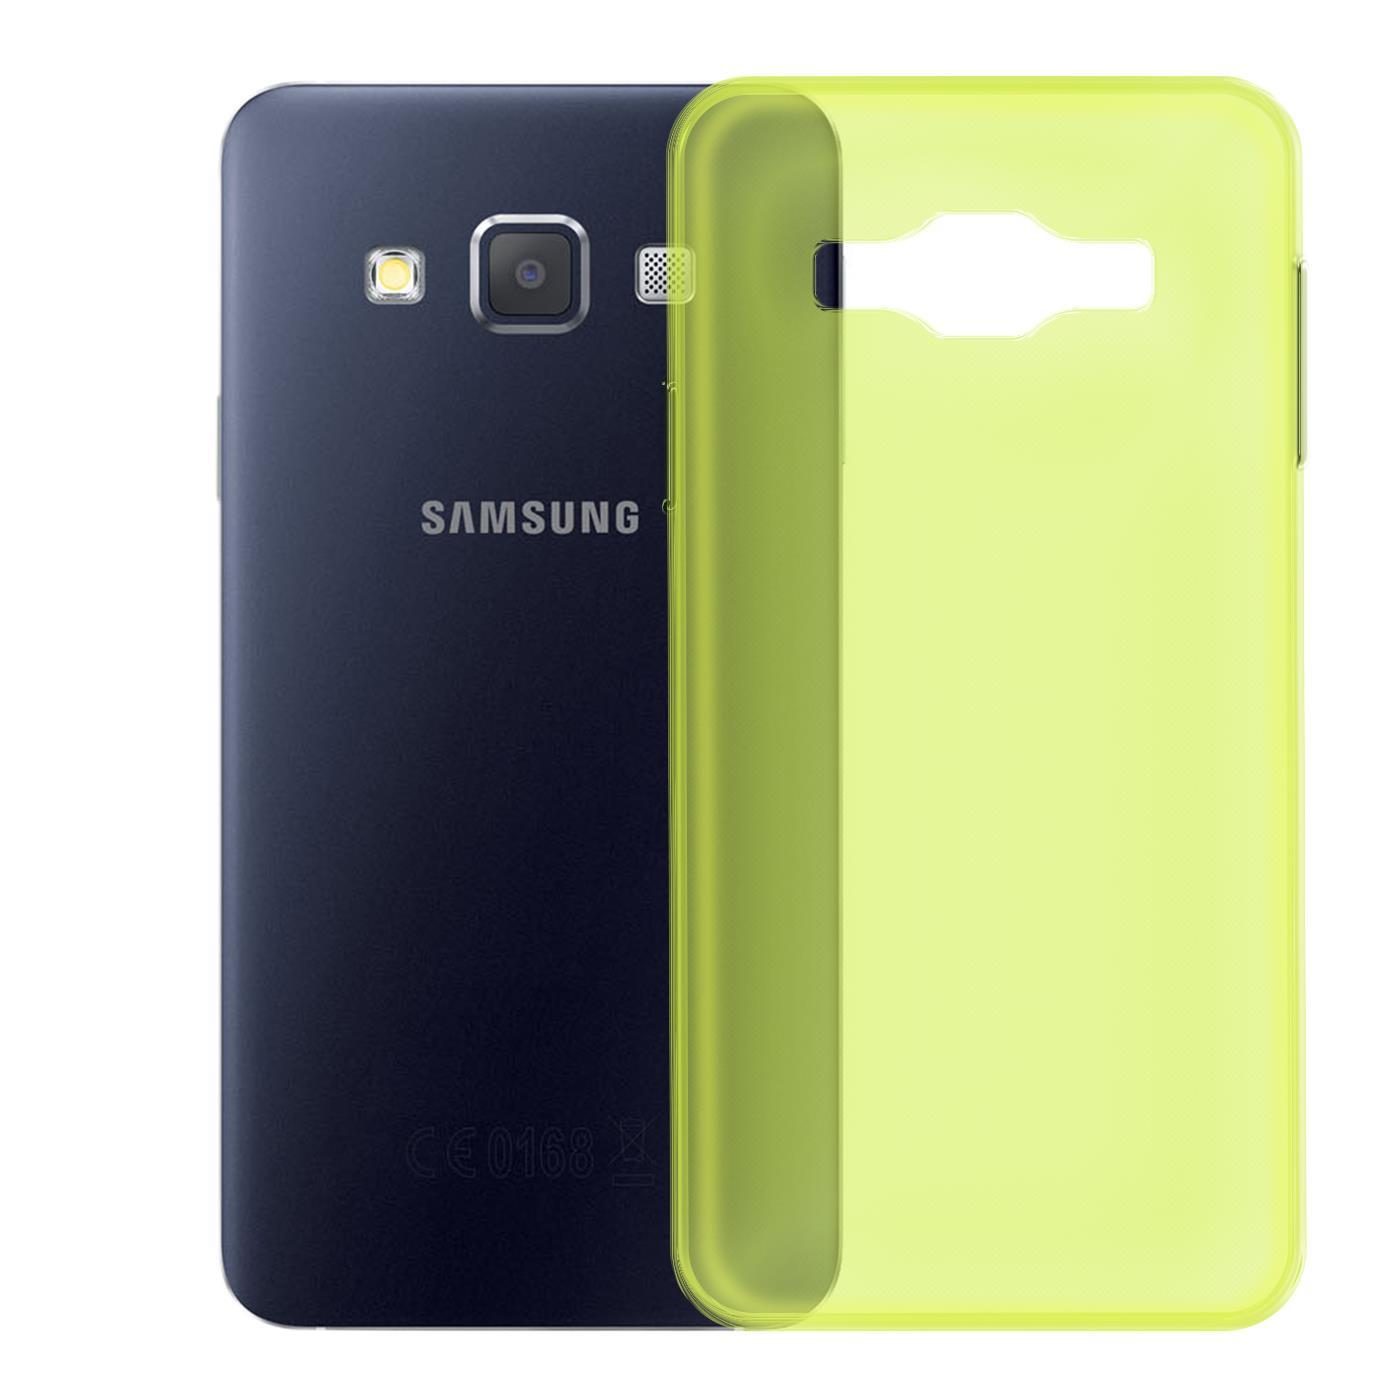 Samsung-Galaxy-A3-2015-Thin-Silicone-Clear-Case-Cover-Ultra-Slim-Shockproof-Gel Indexbild 10